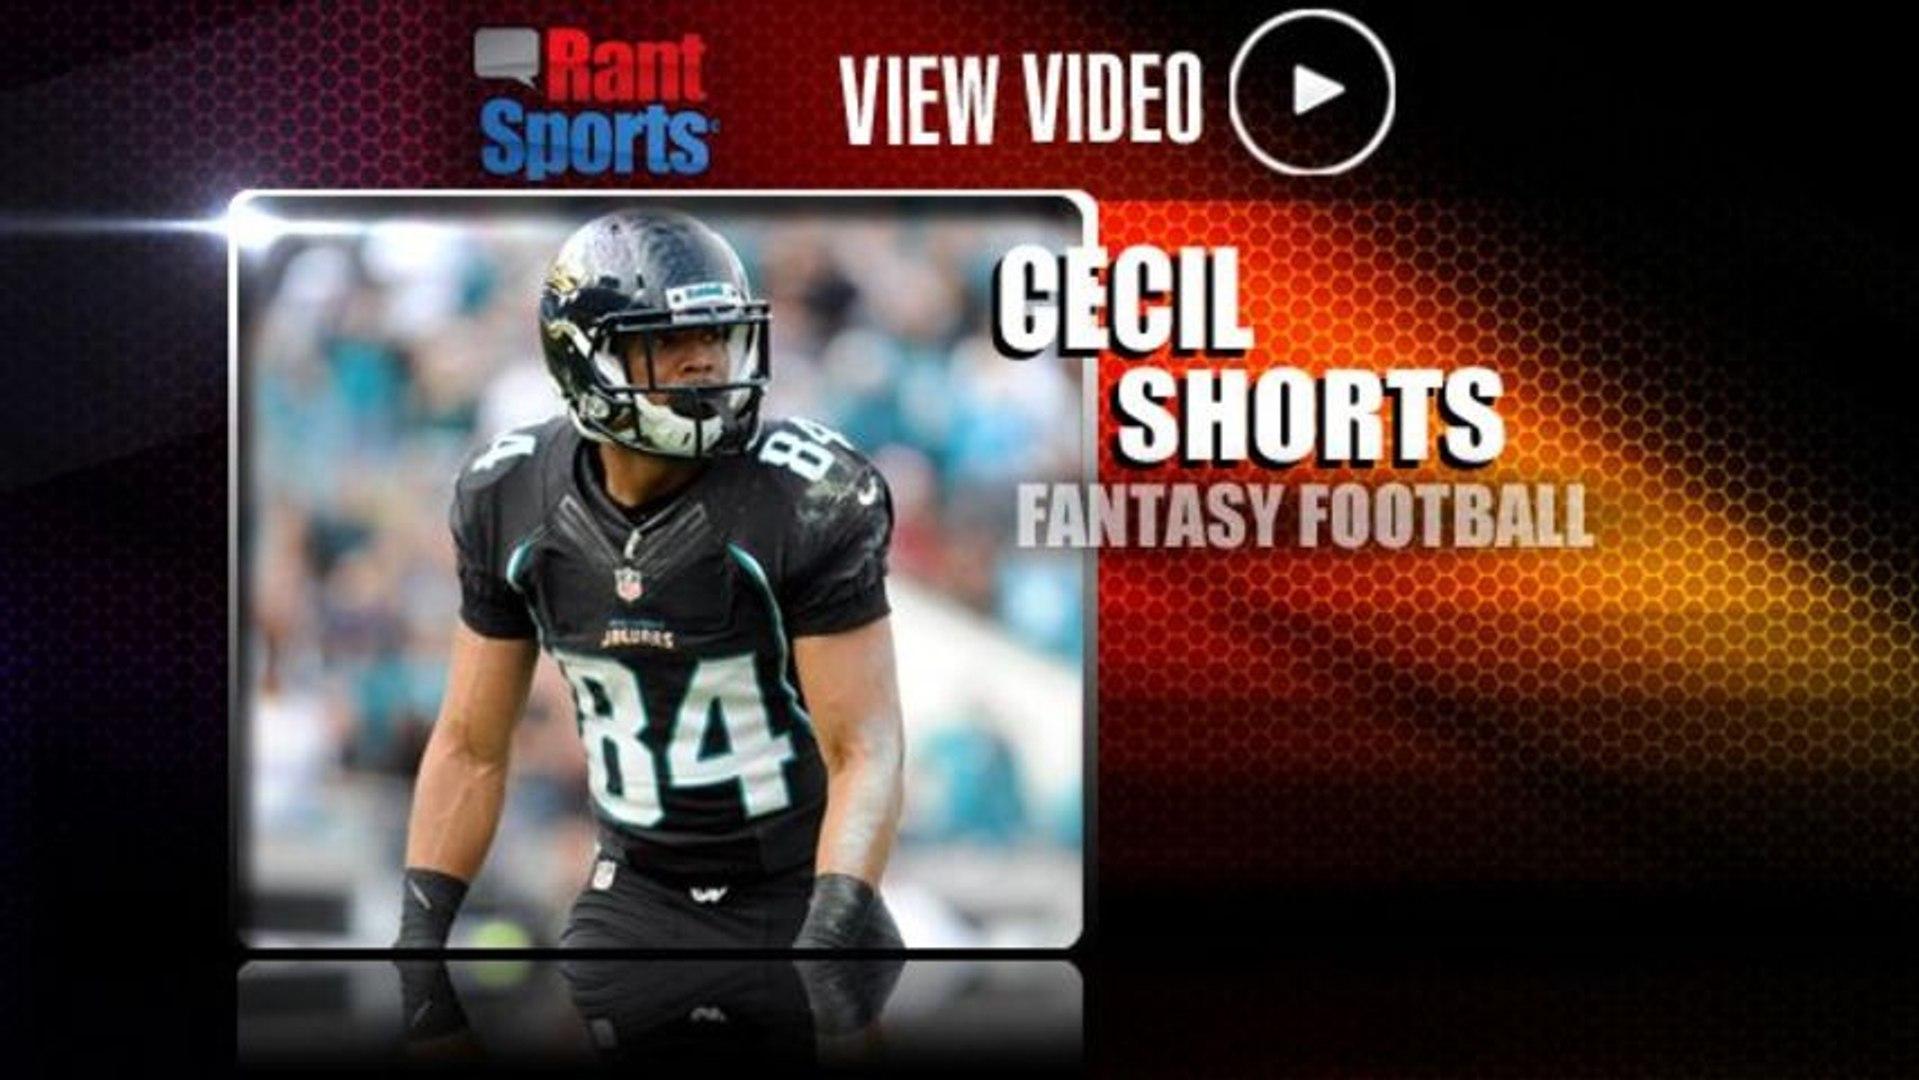 2013 Fantasy Football Profile: Cecil Shorts Remains Under the Radar